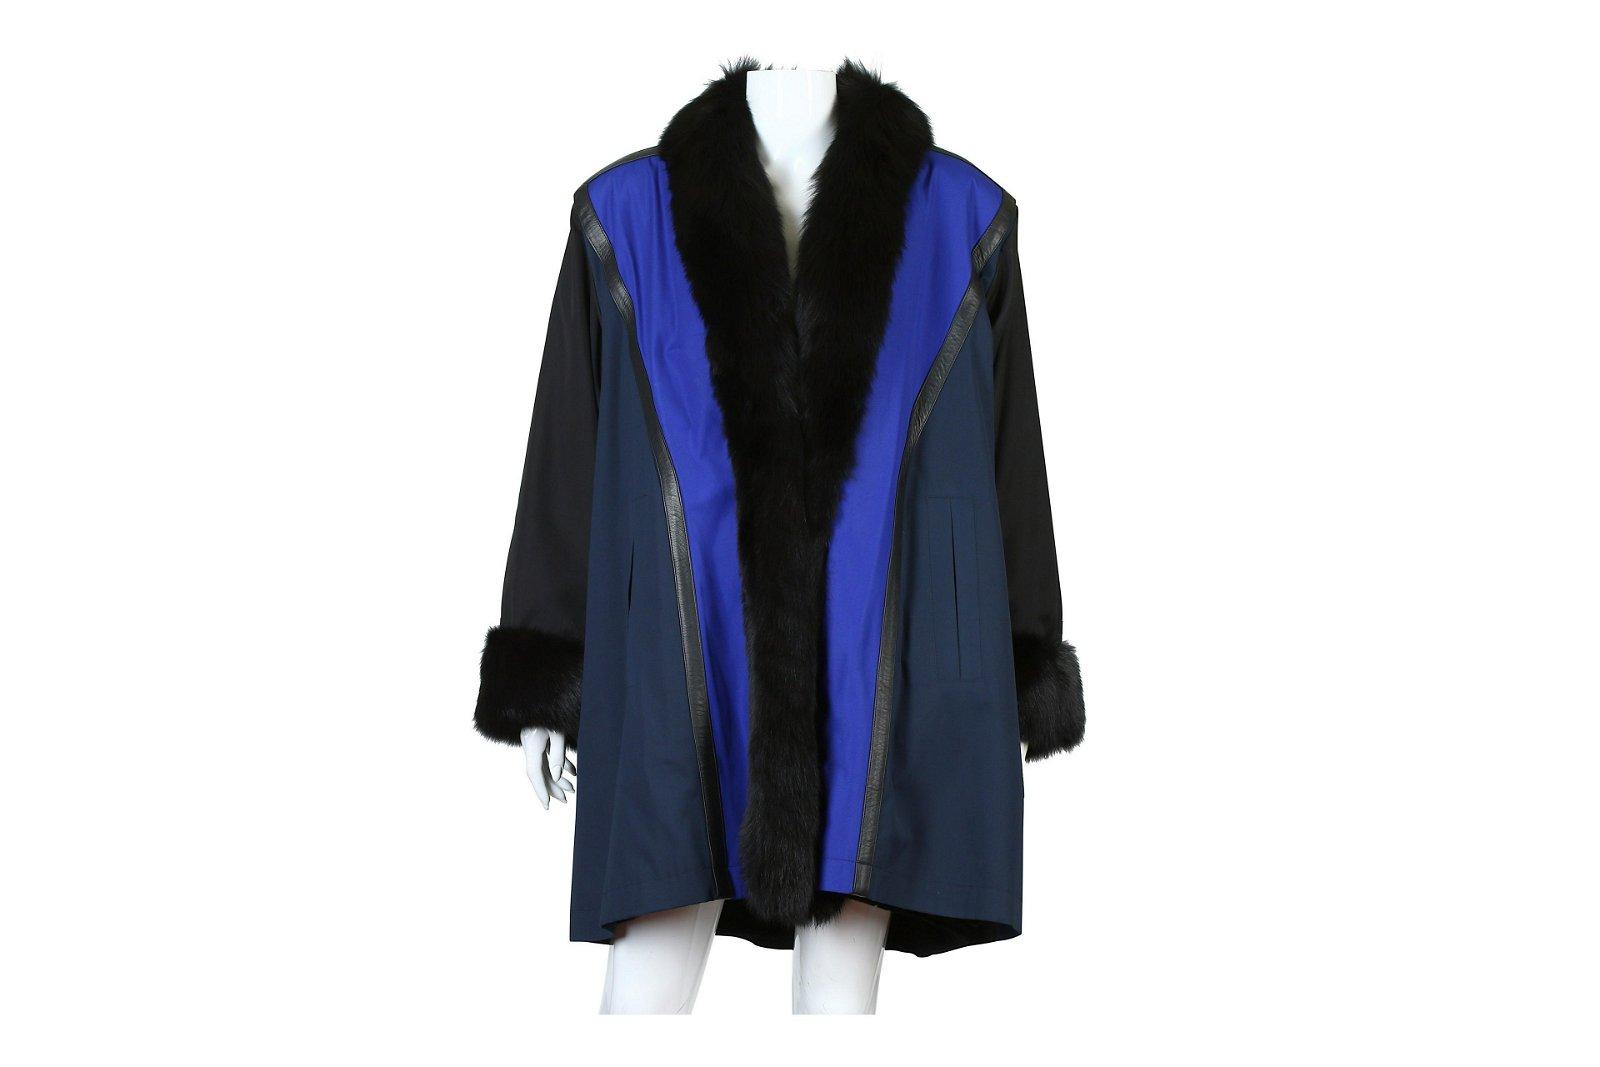 Yves Saint Laurent Fourrures Blue and Black Coat